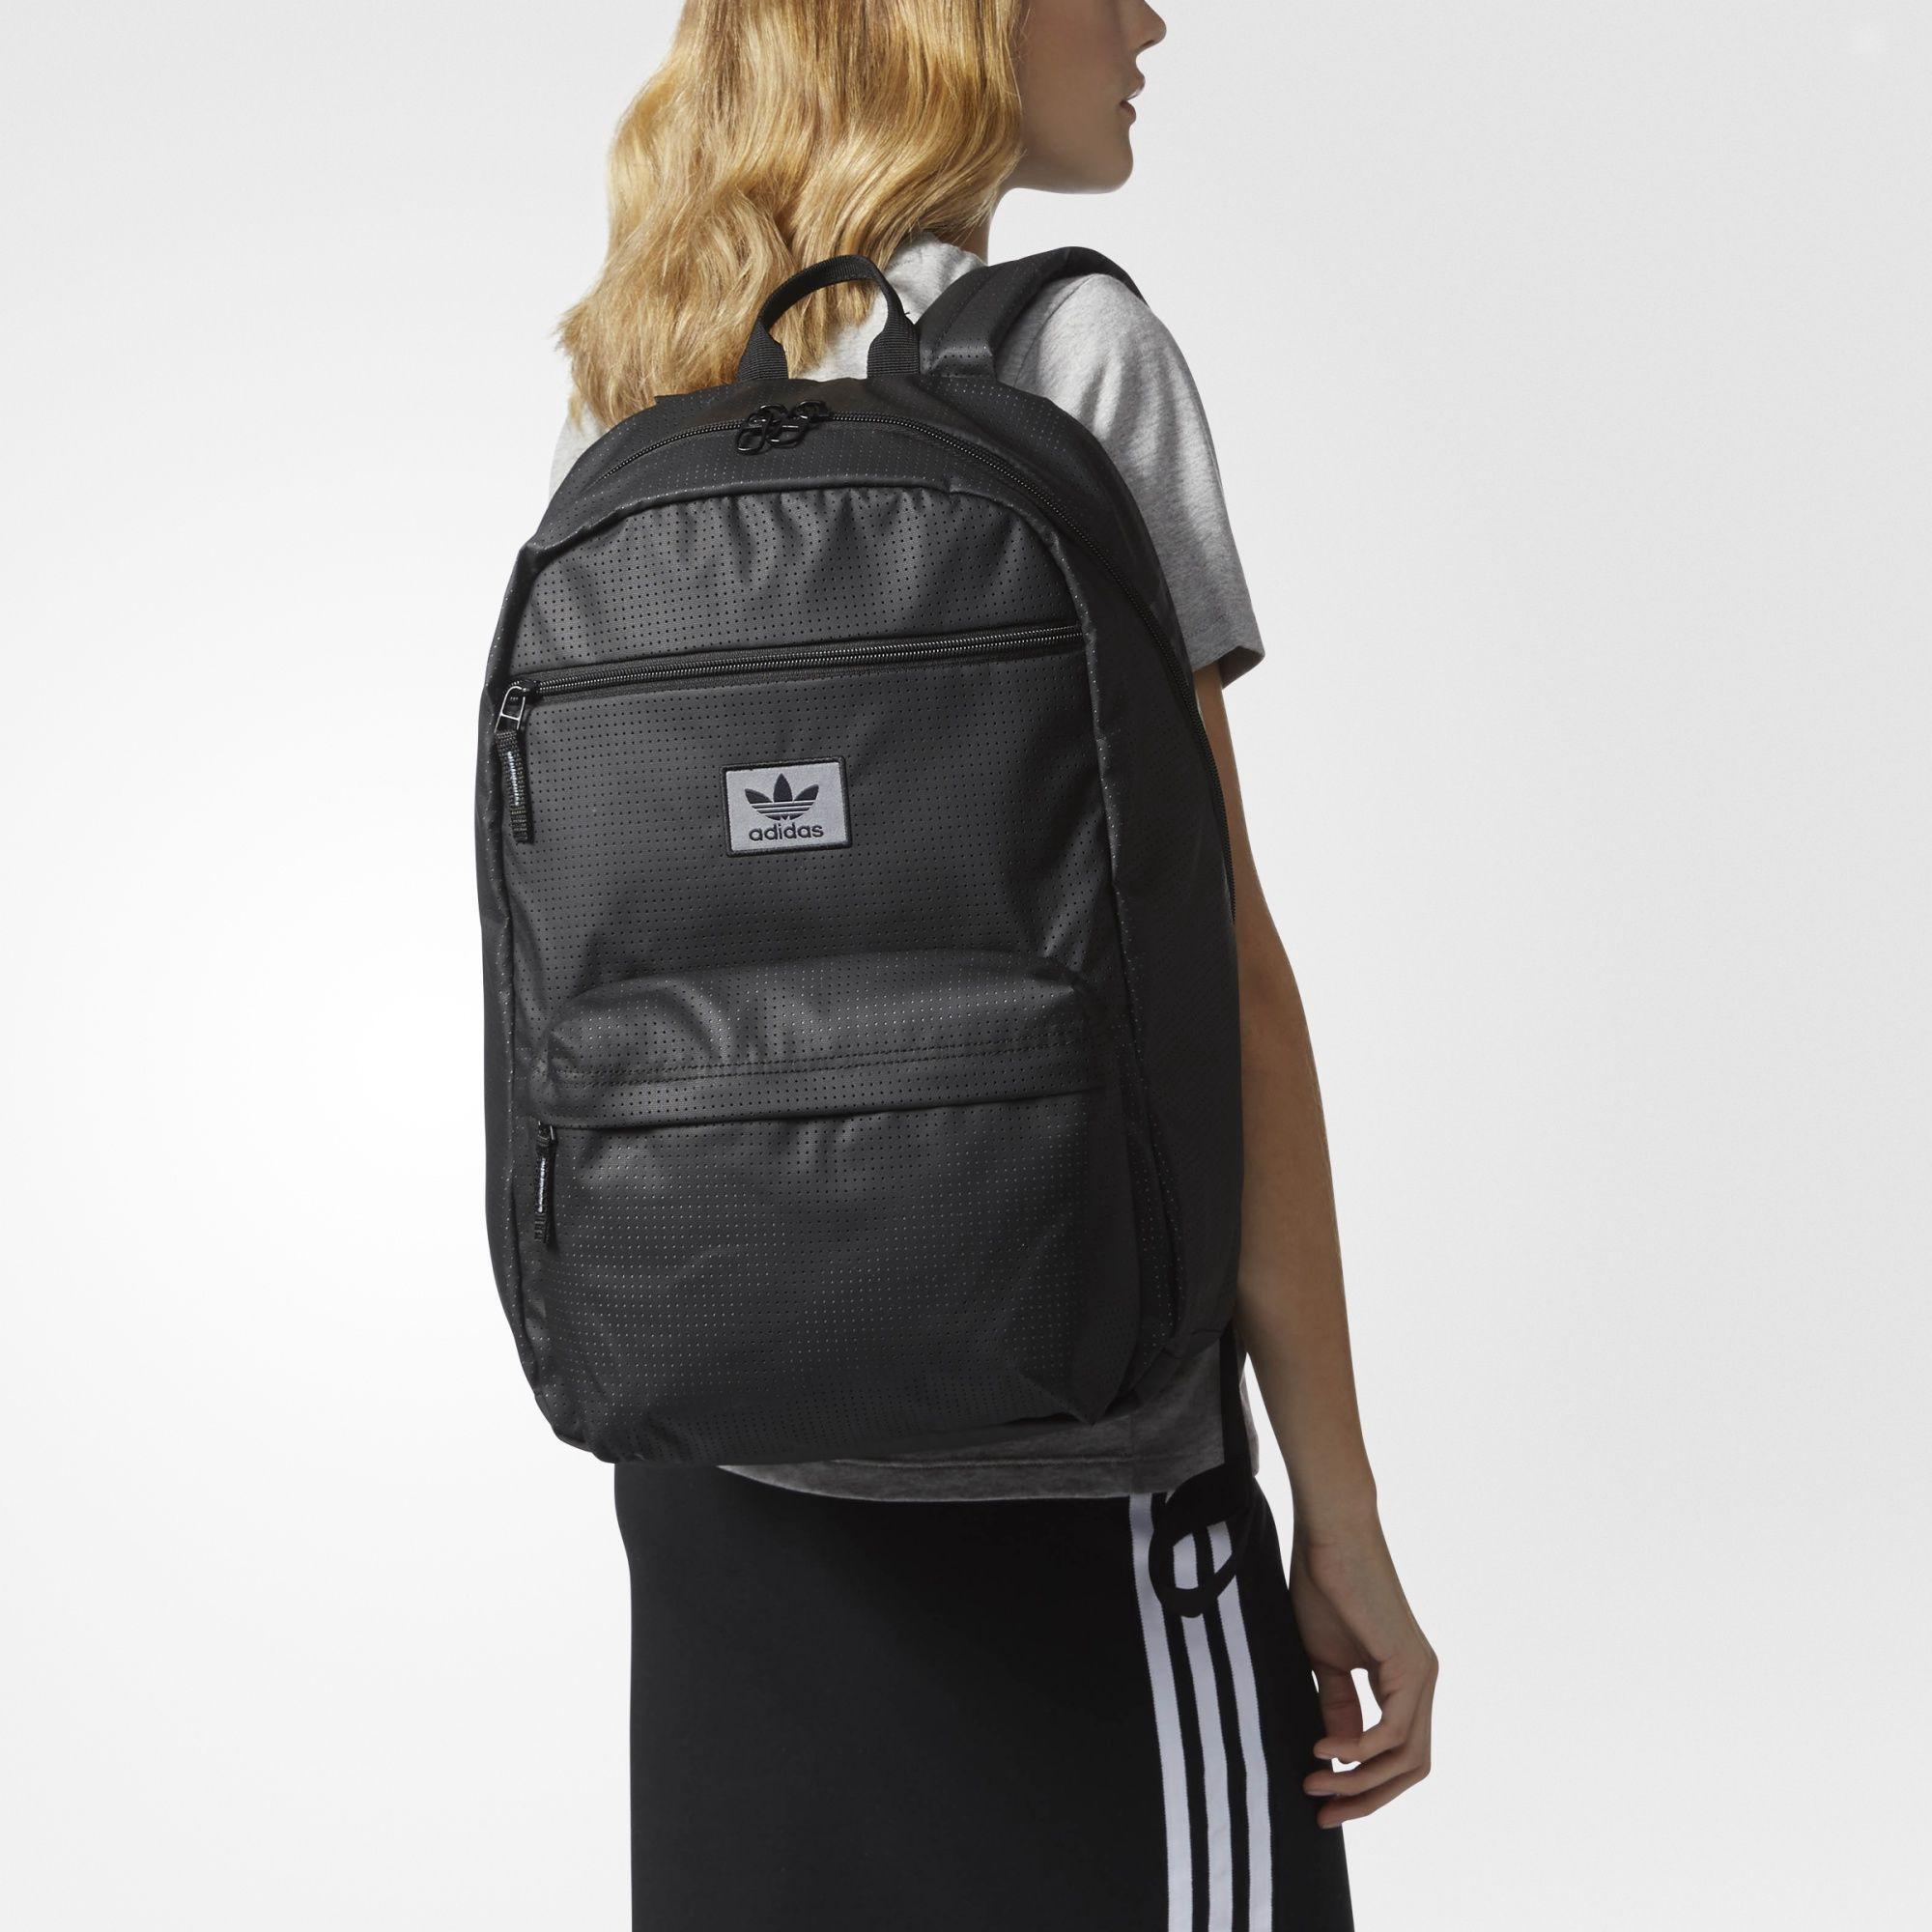 Adidas Originals National Plus Backpack In Black  49585bb04bb16